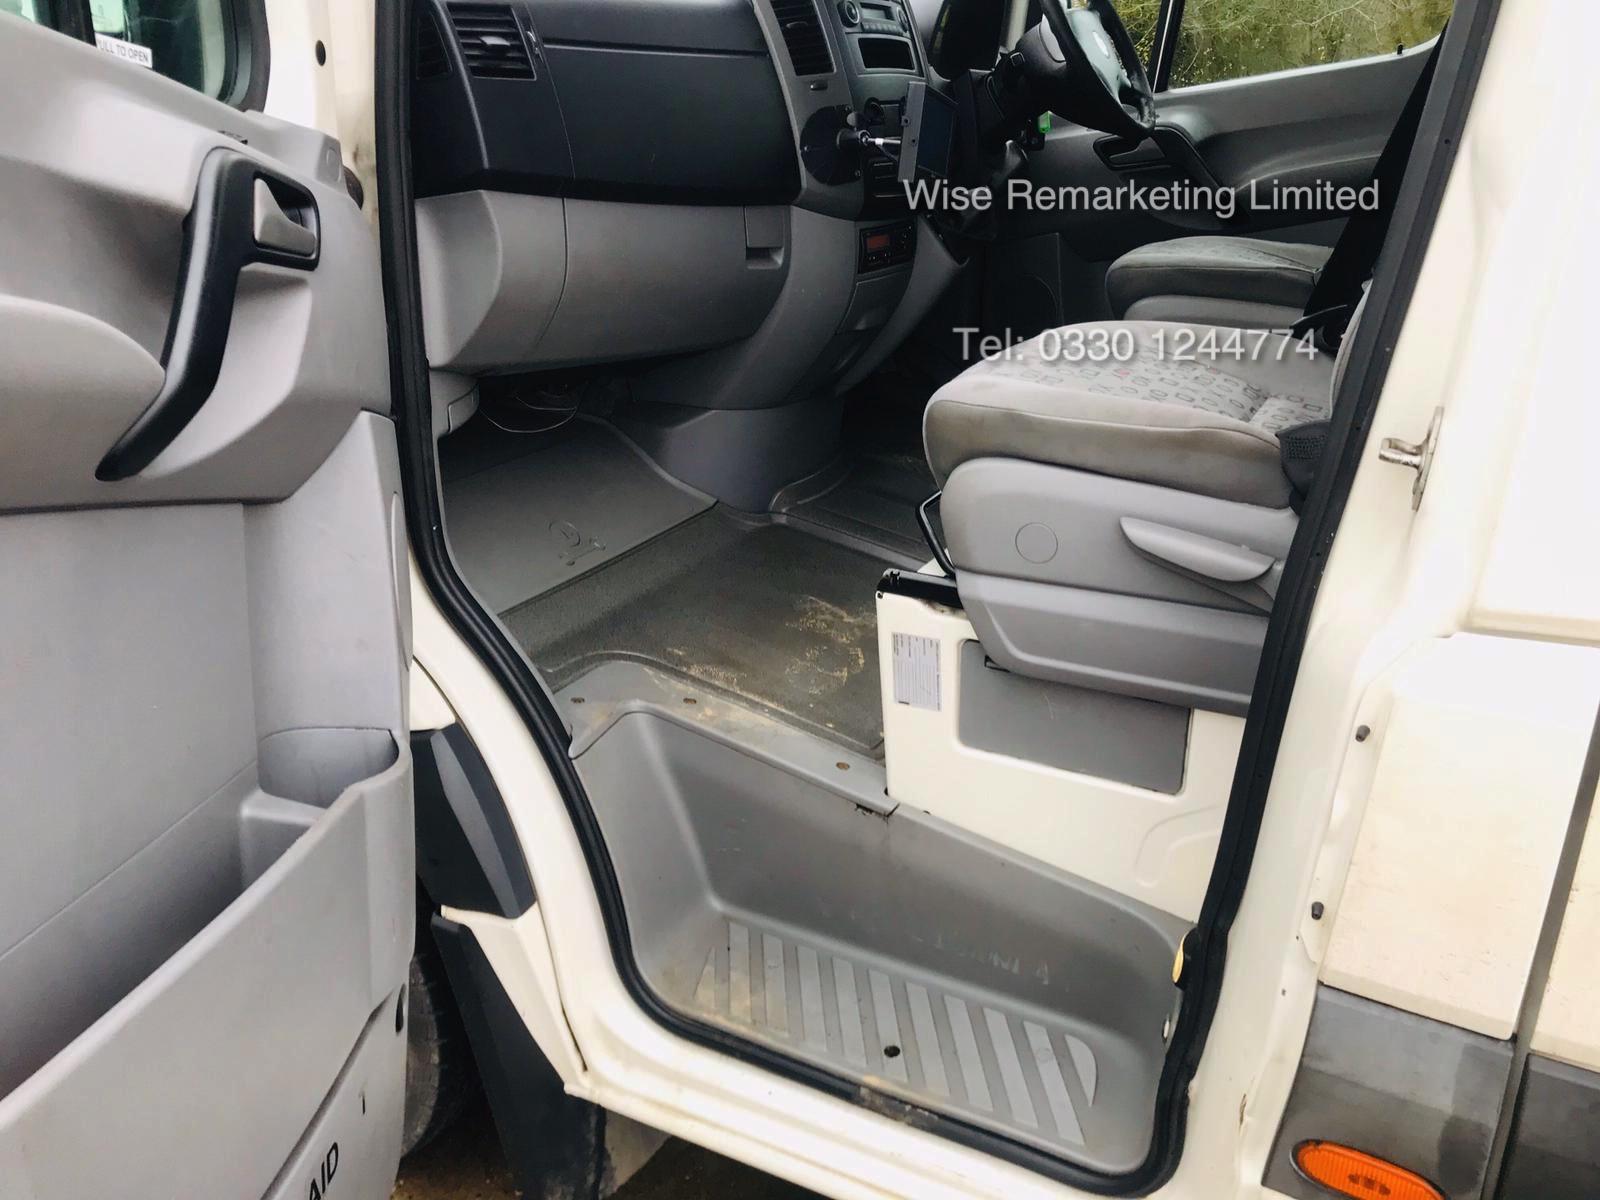 Lot 12 - (RESERVE MET) Volkswagen Crafter 16 Seater Mini Bus 2.5 TDI Auto - LWB - 2010 10 Reg -